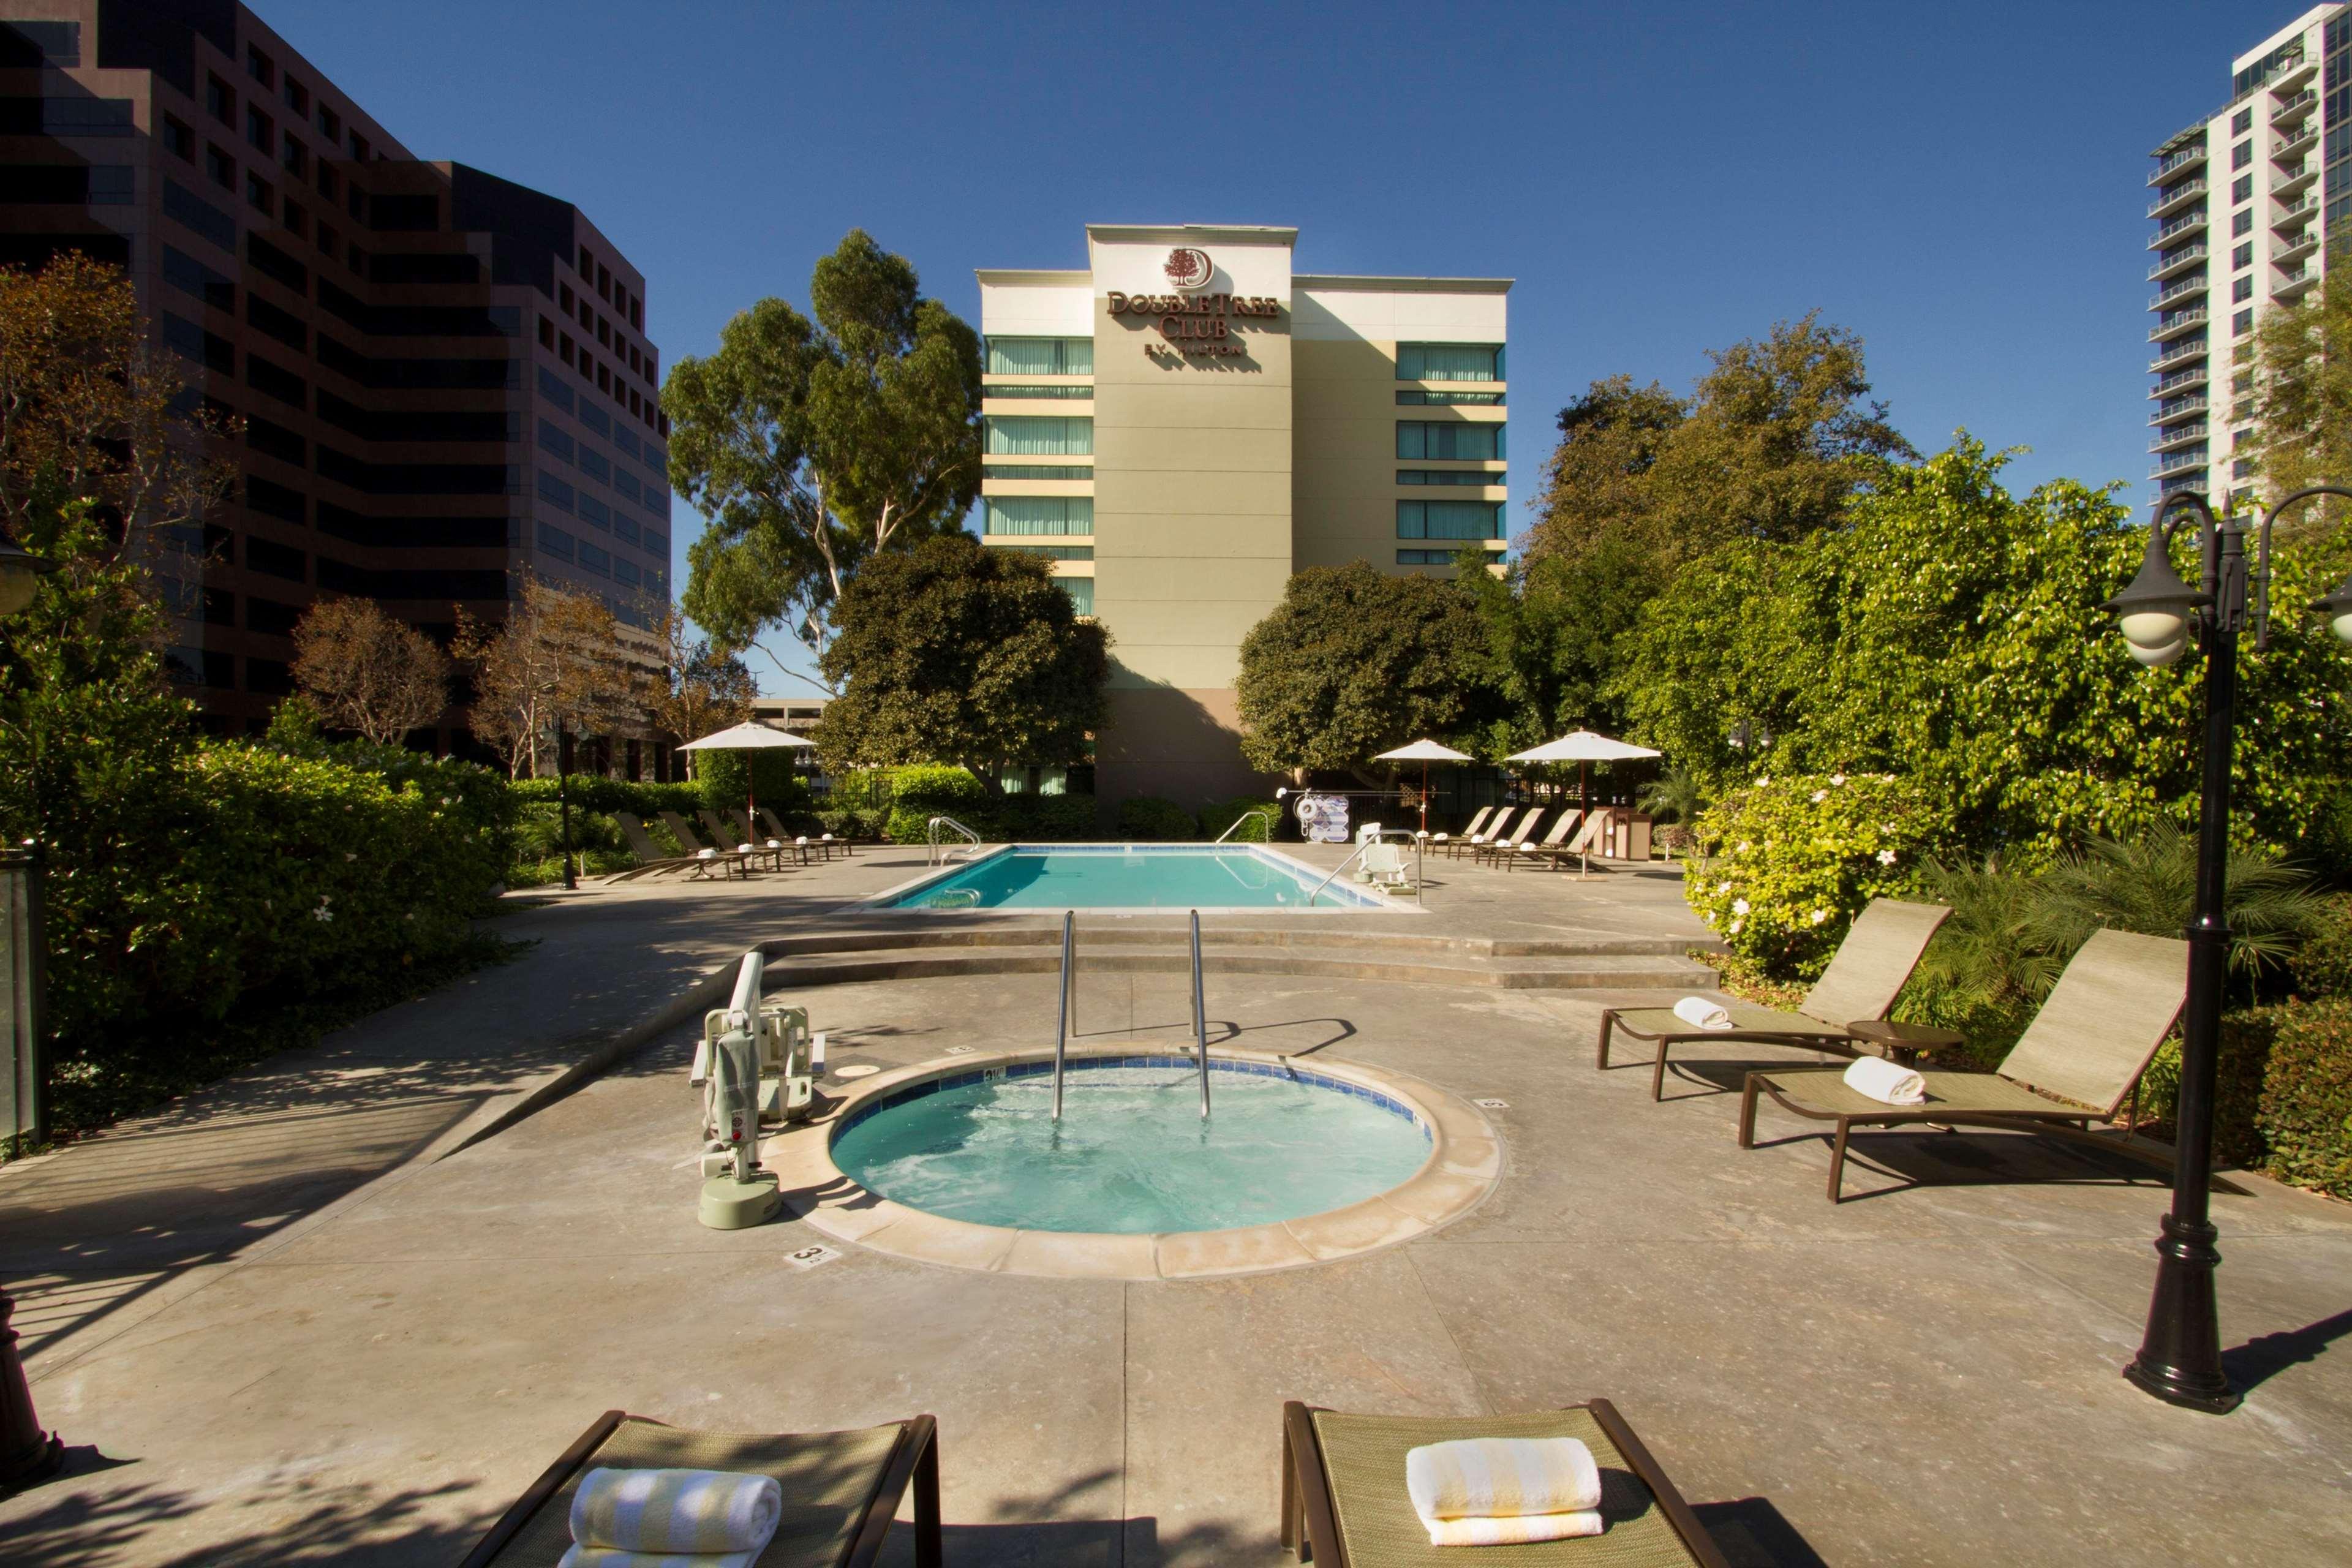 Hilton Hotel Near Orange County Airport